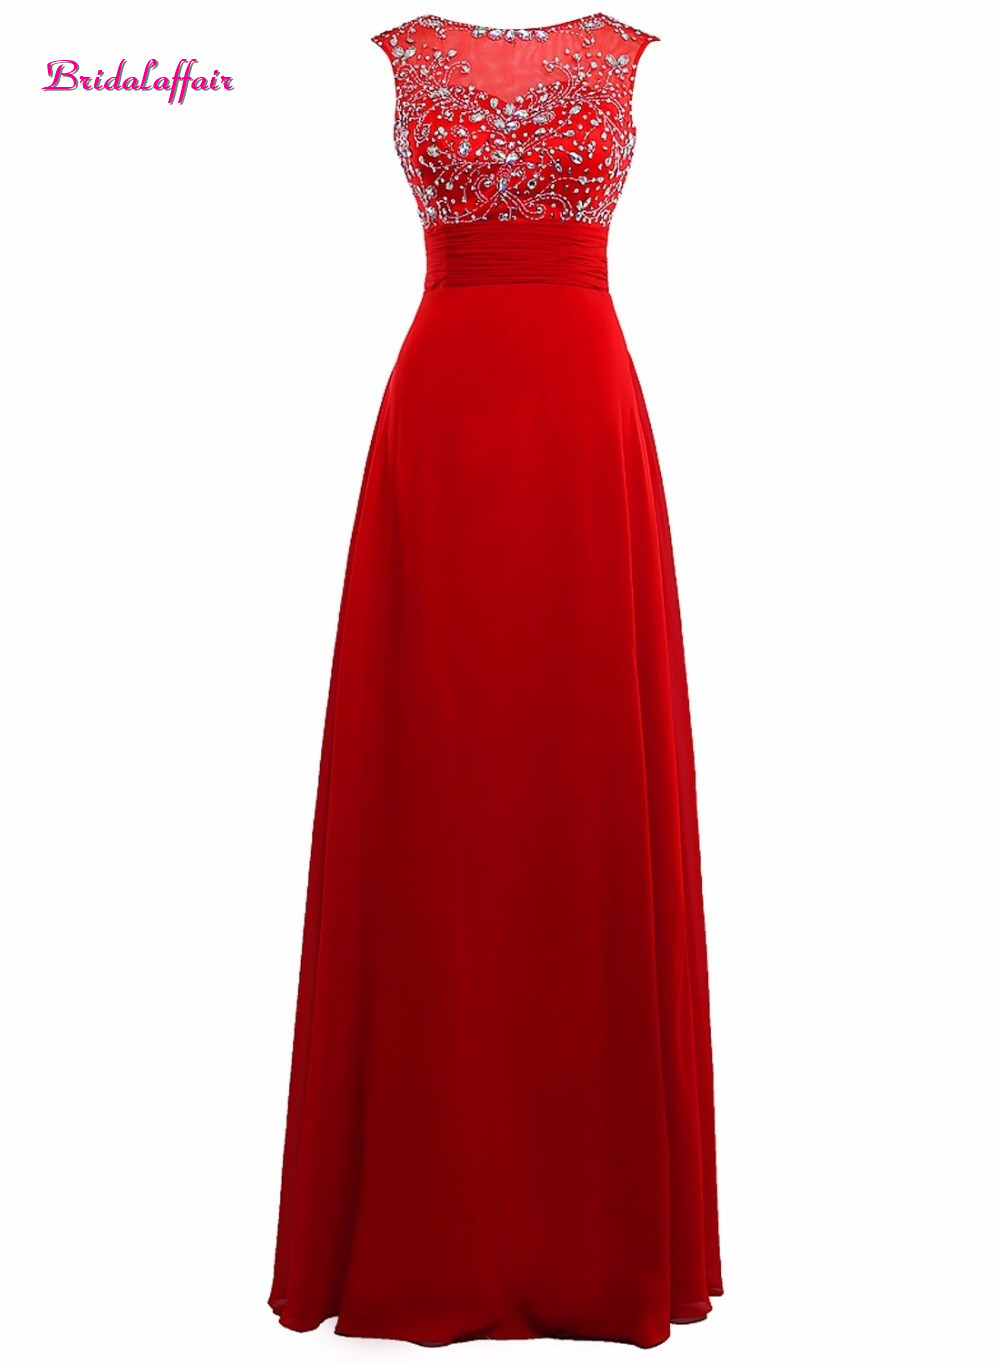 Bridalaffai Real Photo Red Satin Crystal Prom Dresses 2017 Custom made Sleeveless Scoop Neck Party Dress Simple Vestido de festa